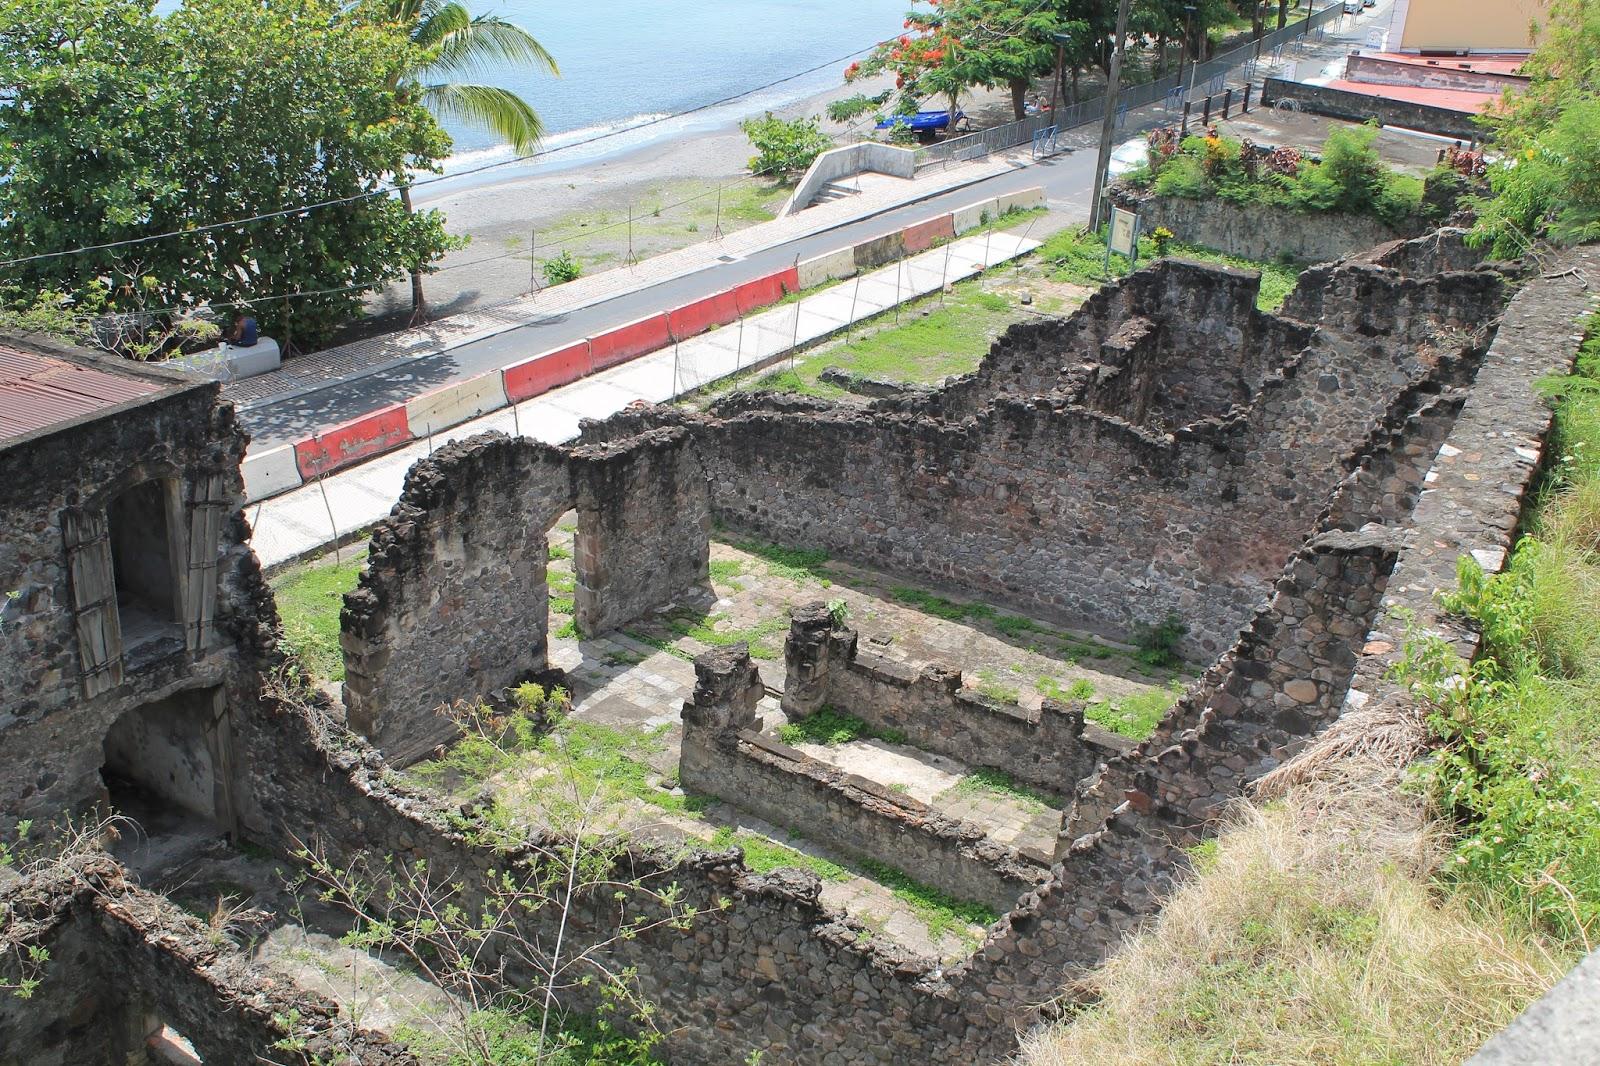 martinique caraibes vacances île dom tom visite saint-pierre ruine